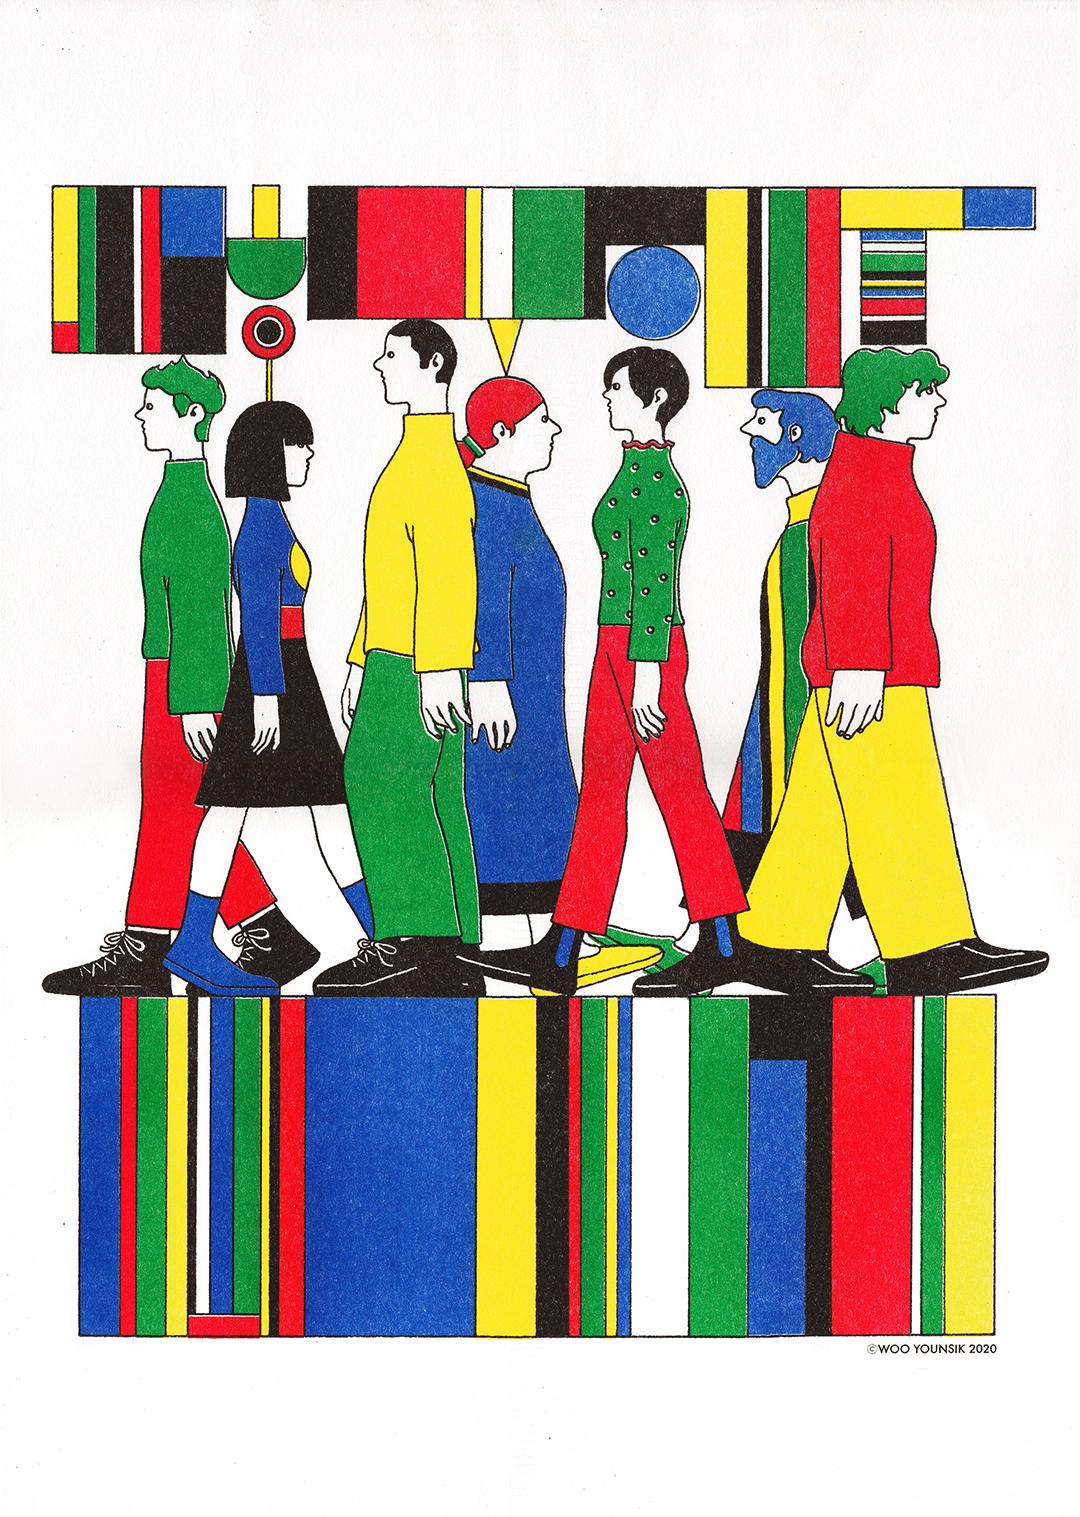 GirlsclubAsia-Illustrator-Younsik Woo-03-Walking as a part_Risograph_2020